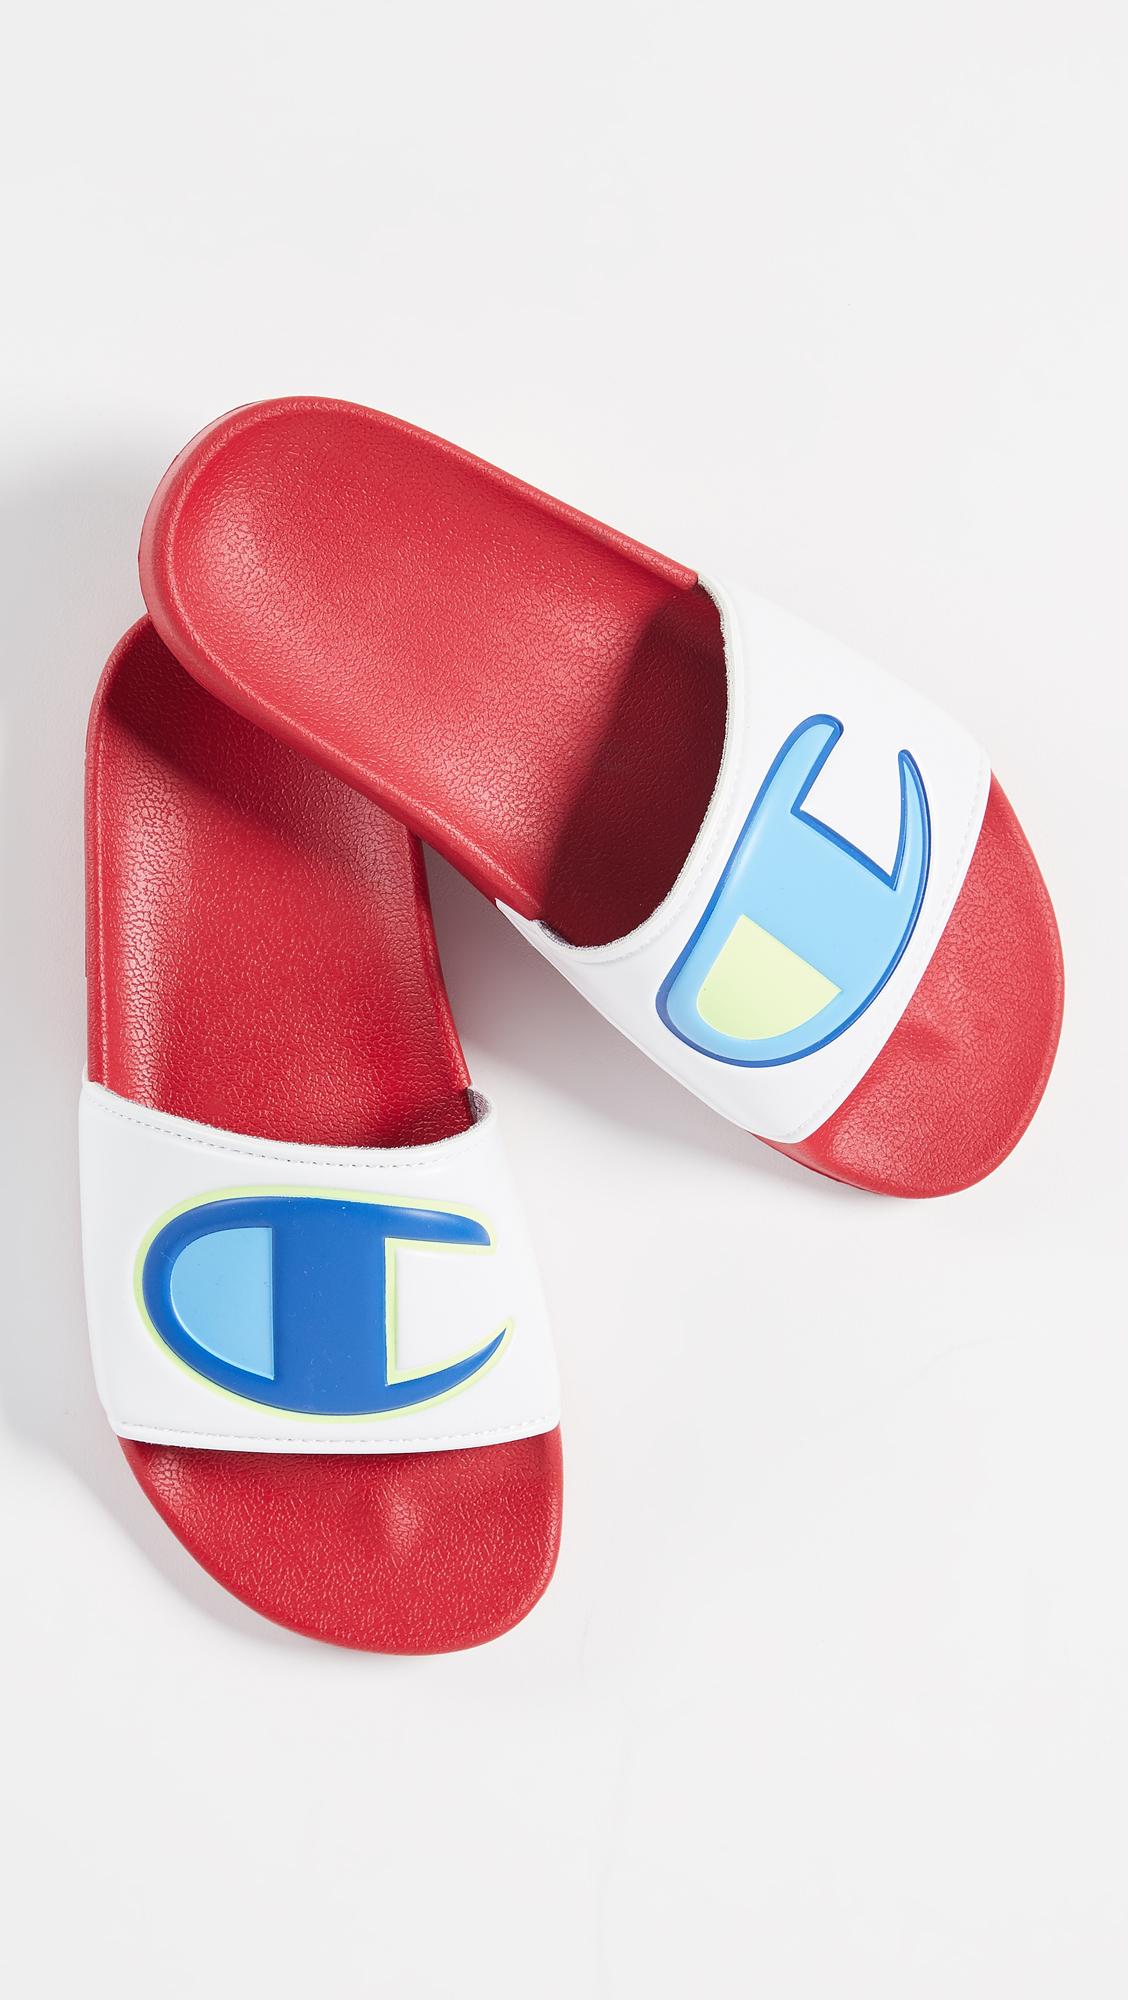 623c783c1899 Champion IPO Colorblock Slides